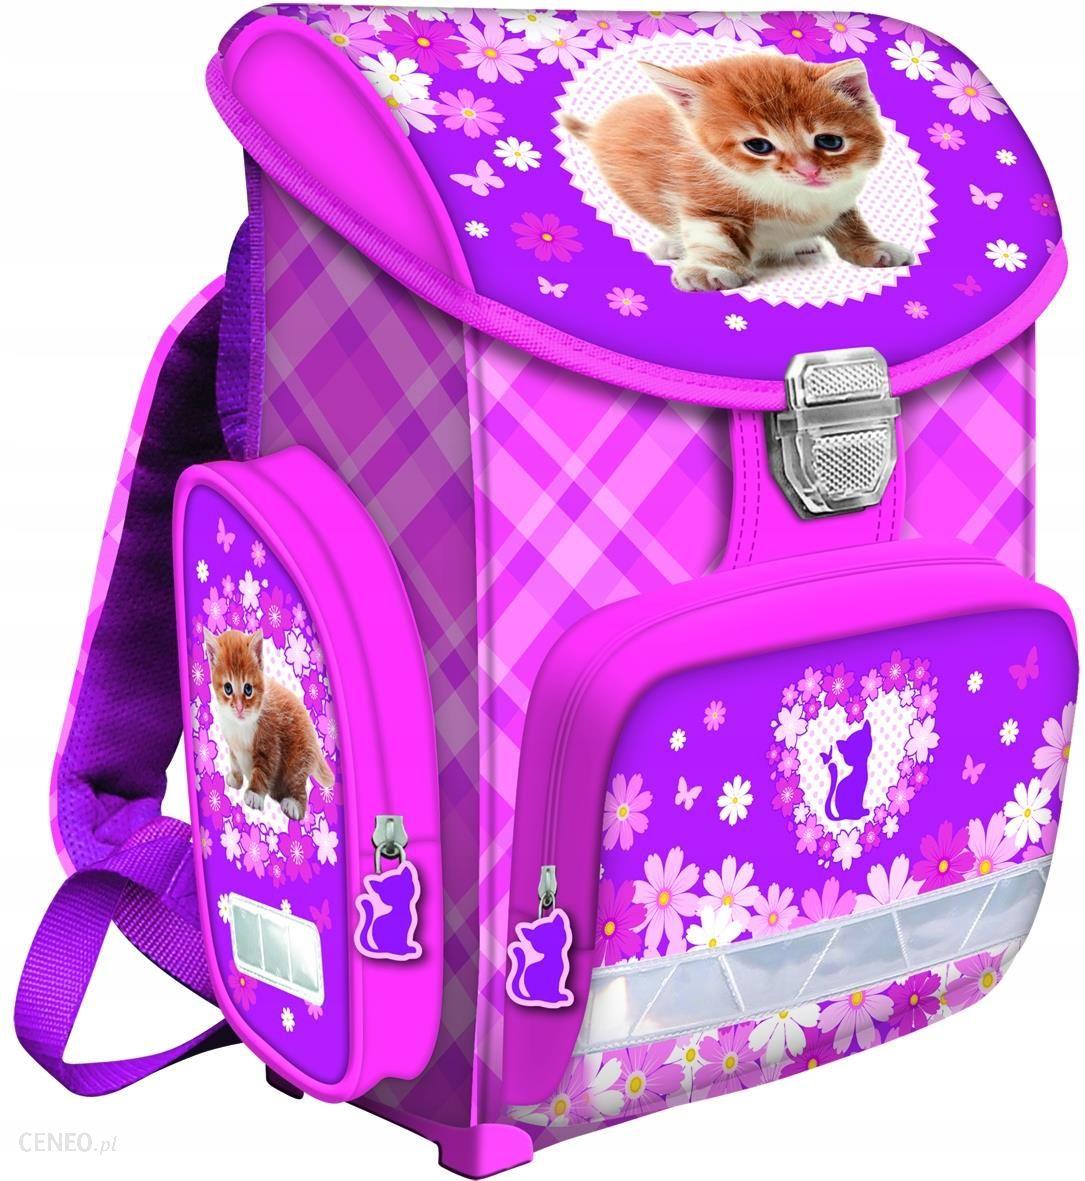 4d8d8b3bf10ca St.Majewski Tornister Szkolny Cats Bambino (55051) - Ceny i opinie ...